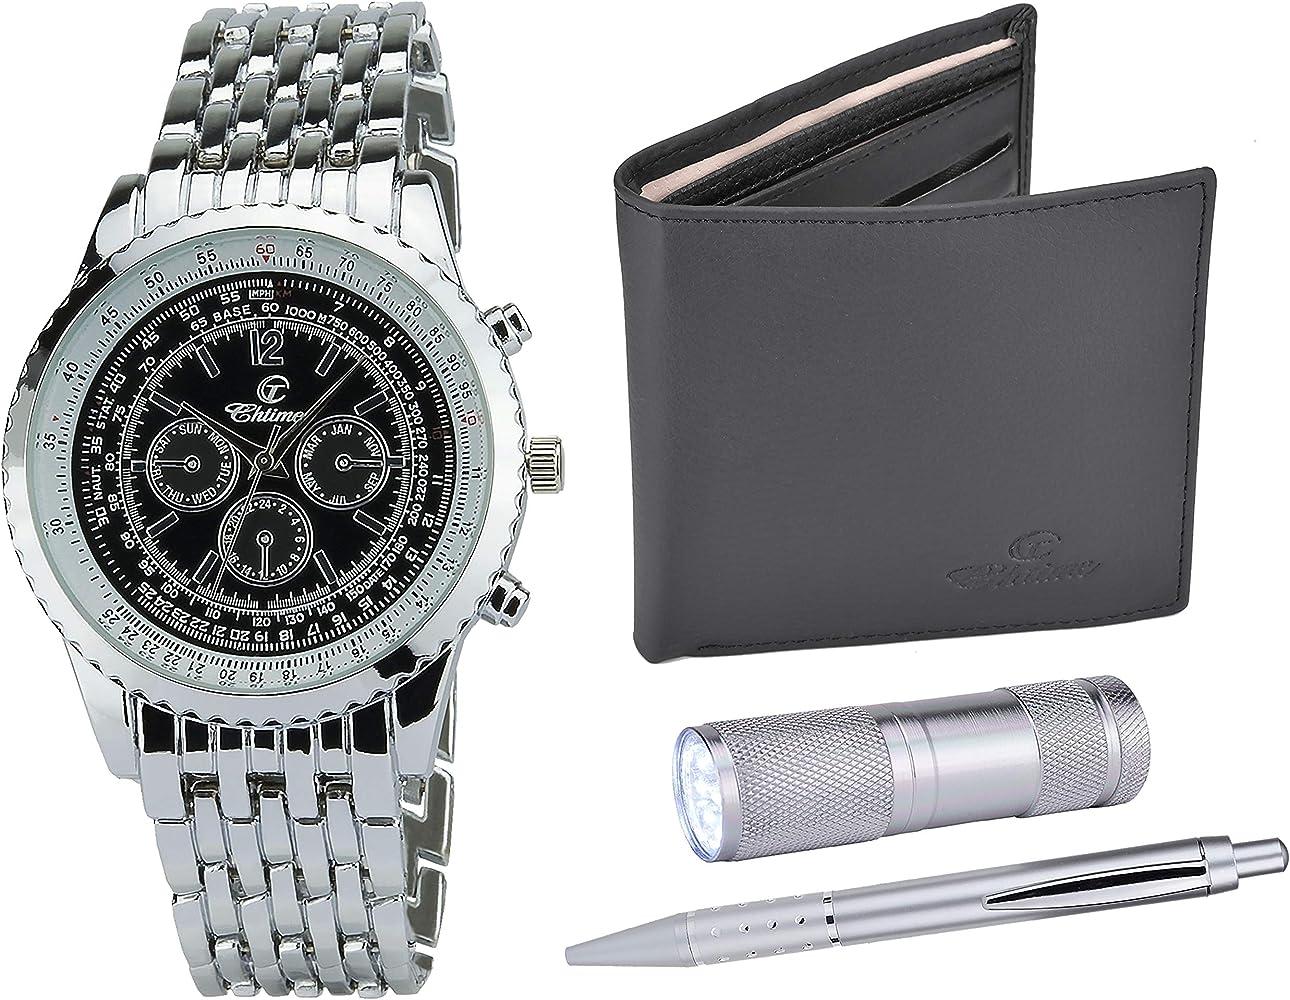 Caja de Regalo Reloj Hombre Negro- Lámpara LED - Billetera -Bolígrafo: Amazon.es: Relojes